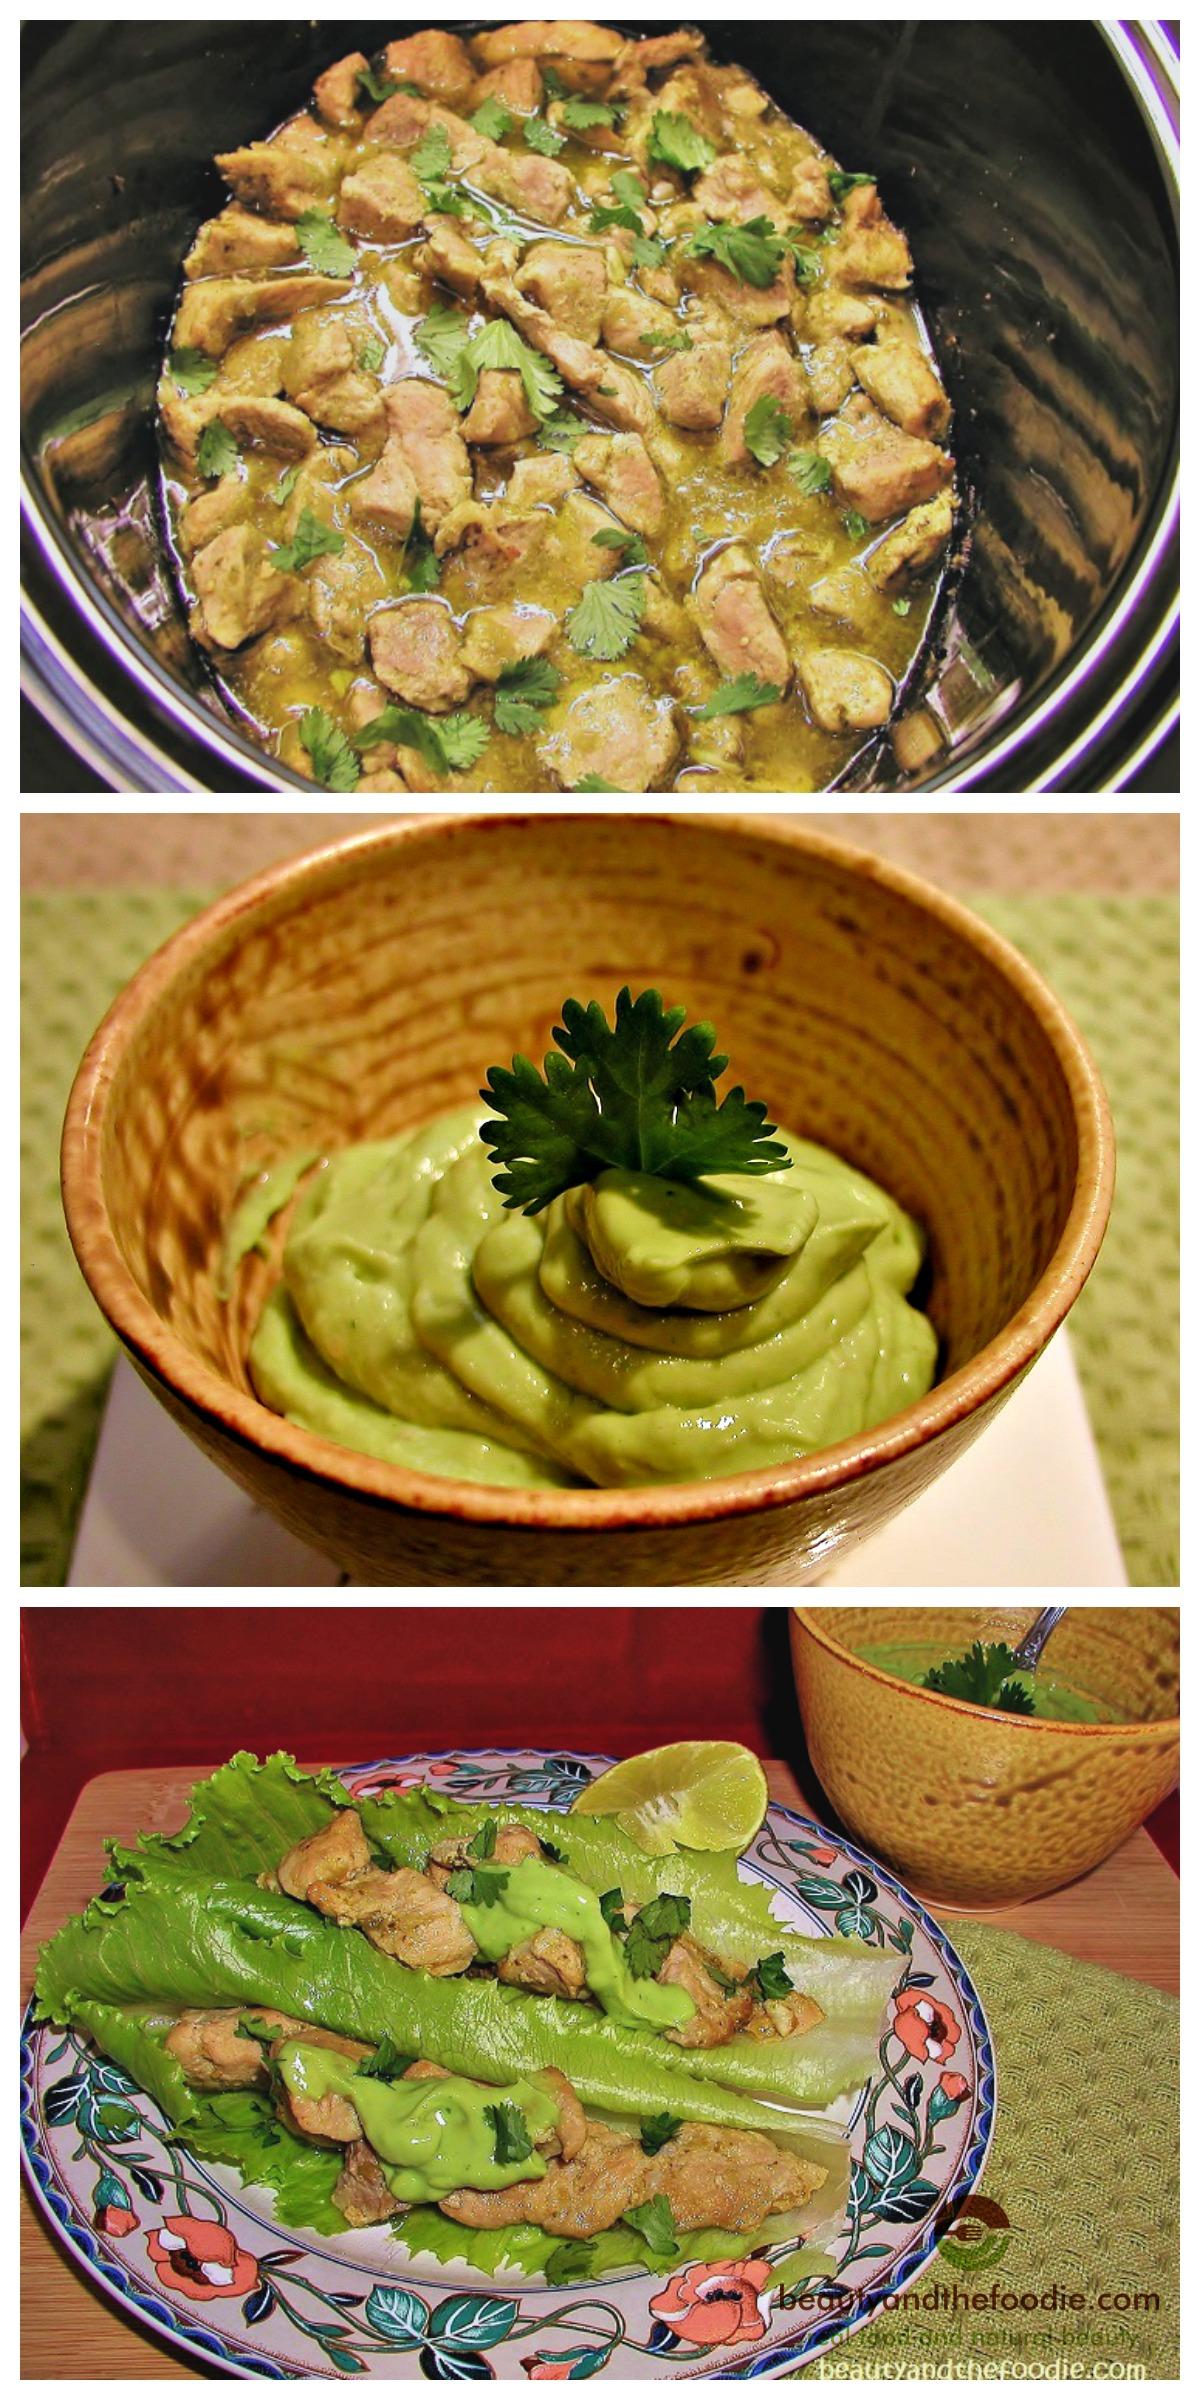 Paleo Crock Pot Chile Verde Tacos with Avocado Cilantro Lime Sauce ...